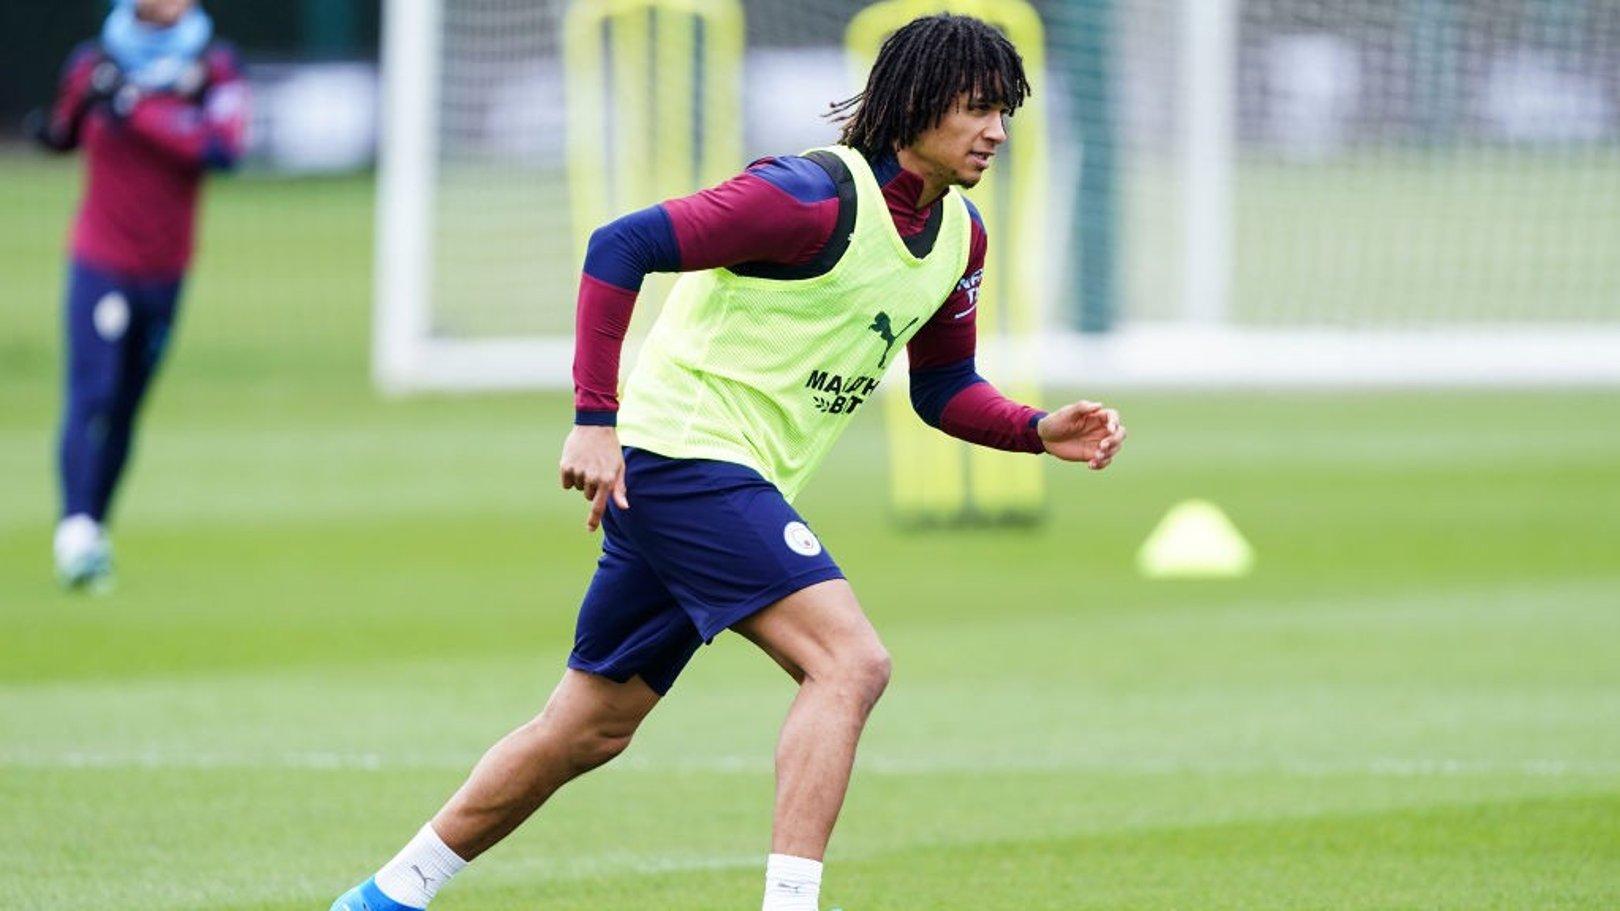 City v Leeds: Ake returns as City make seven changes